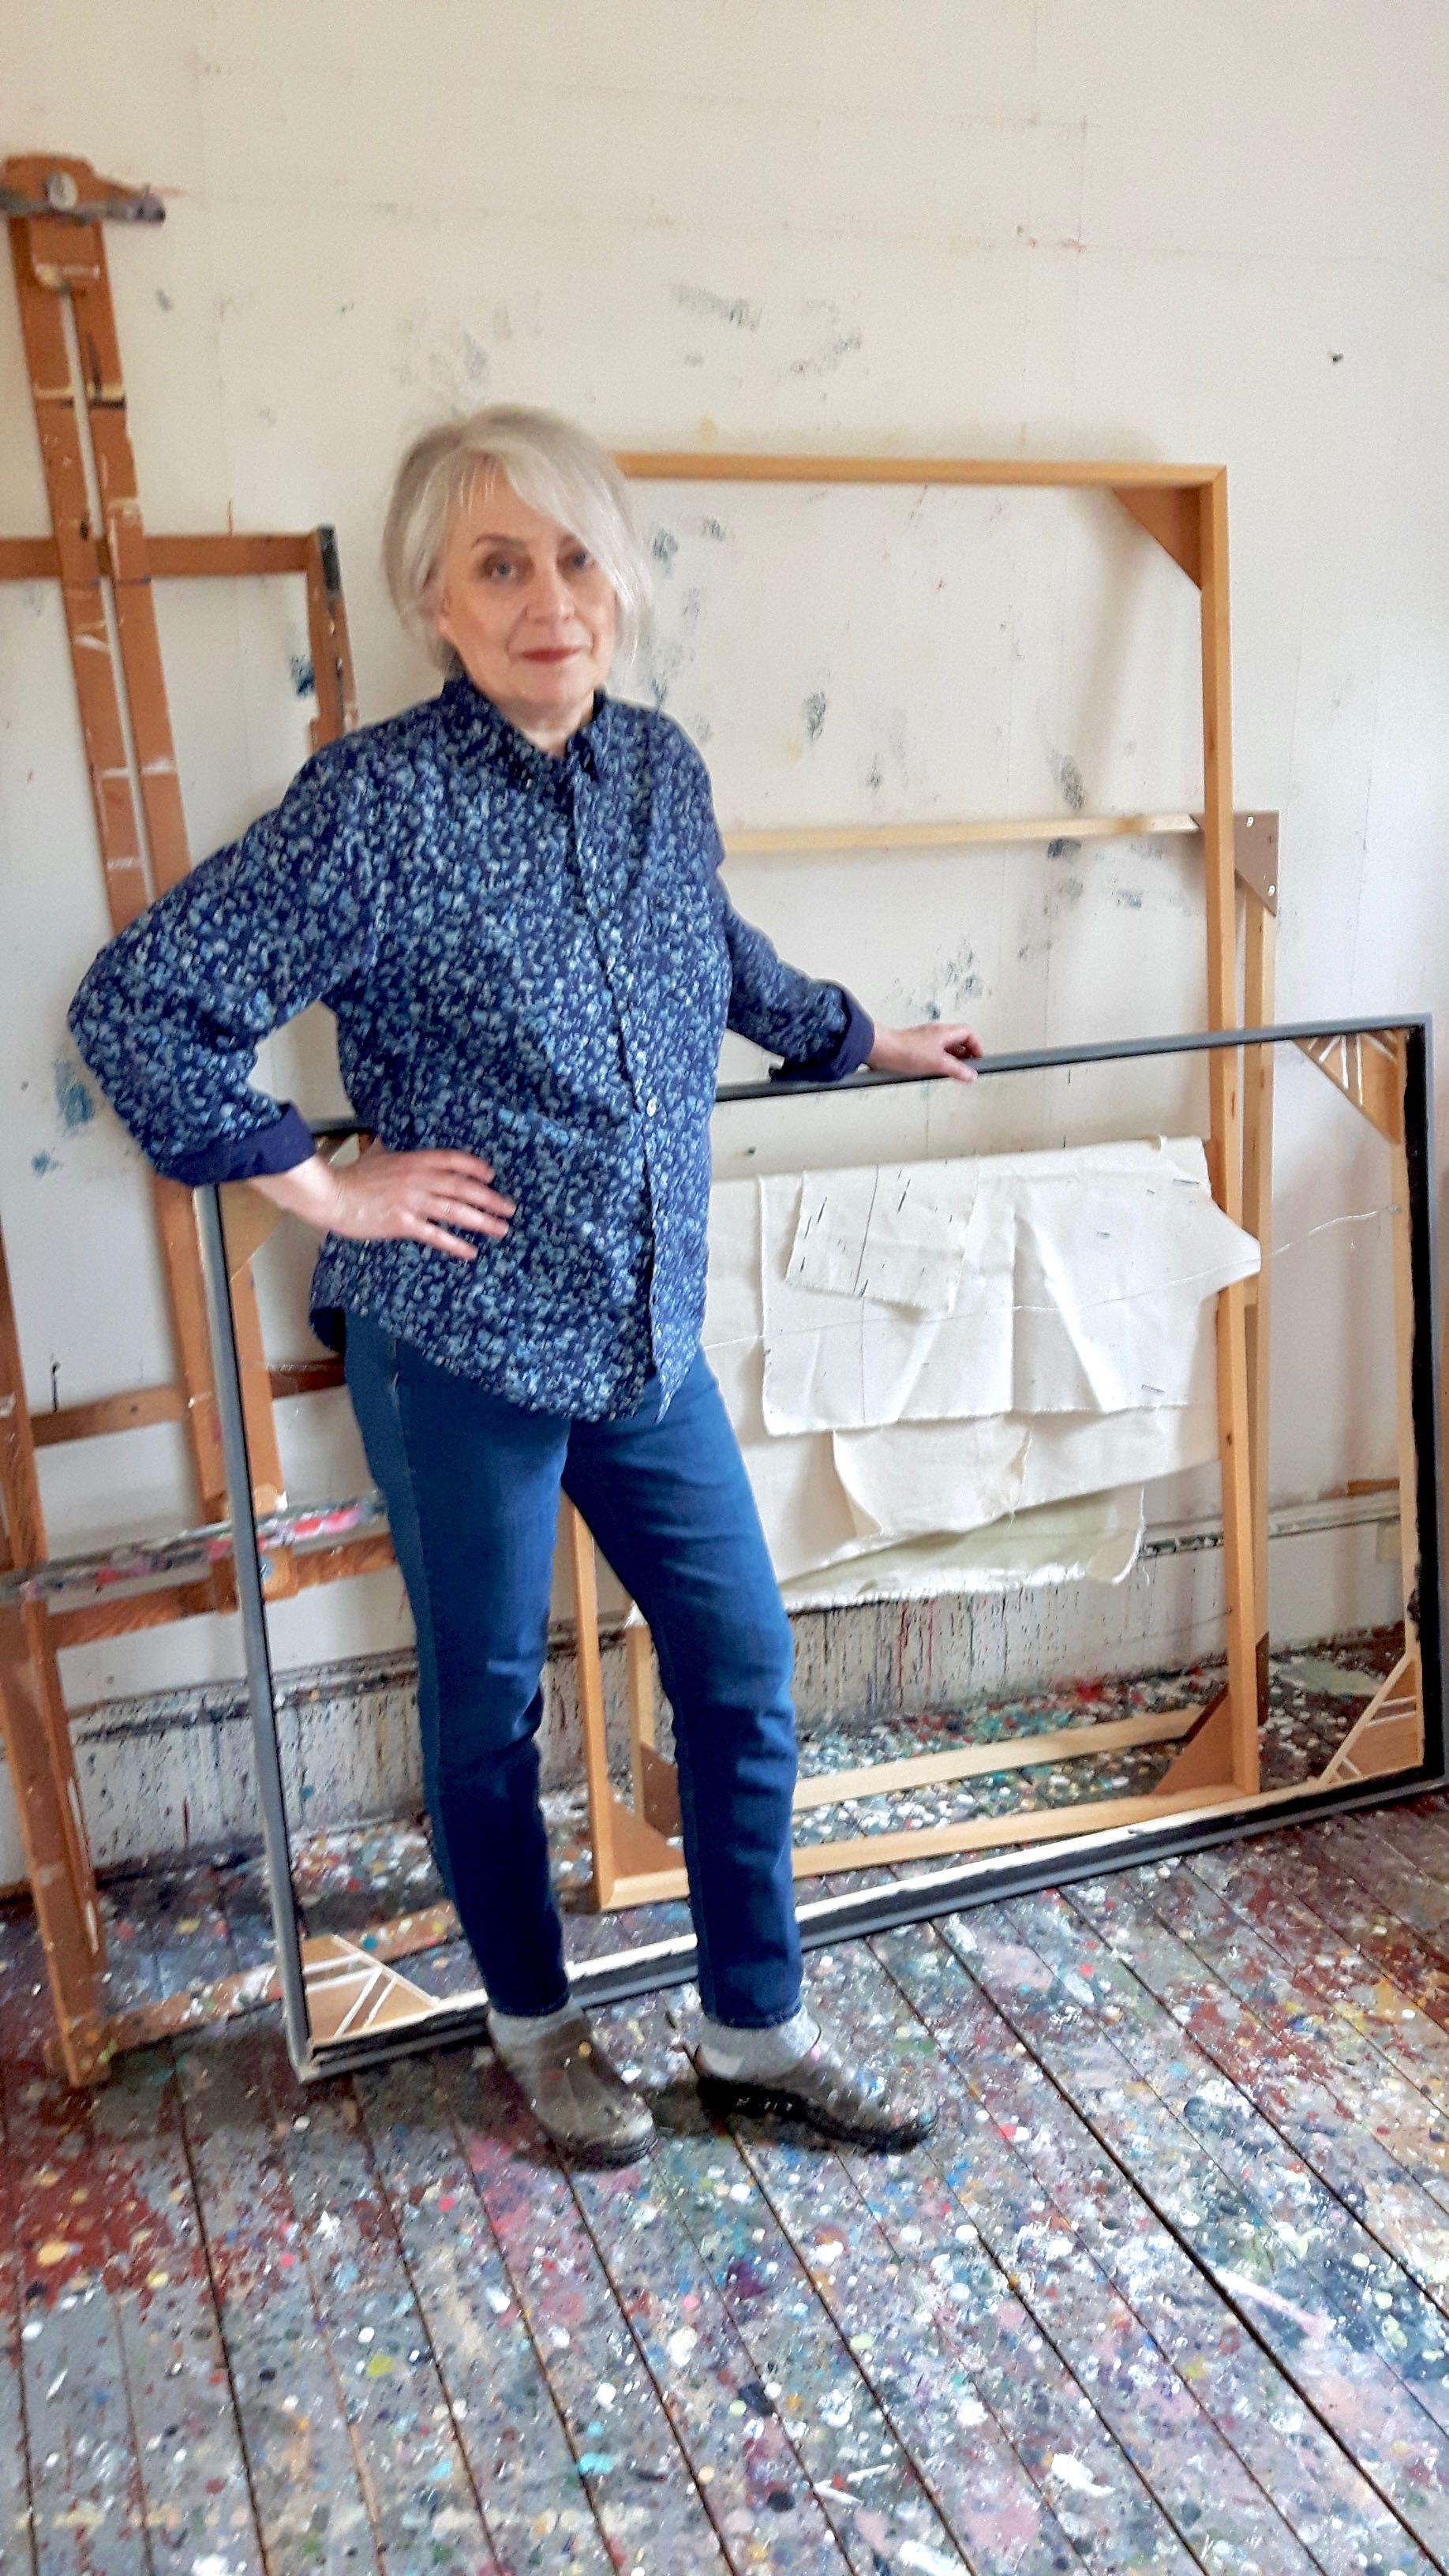 Artist in her studio, April 2017